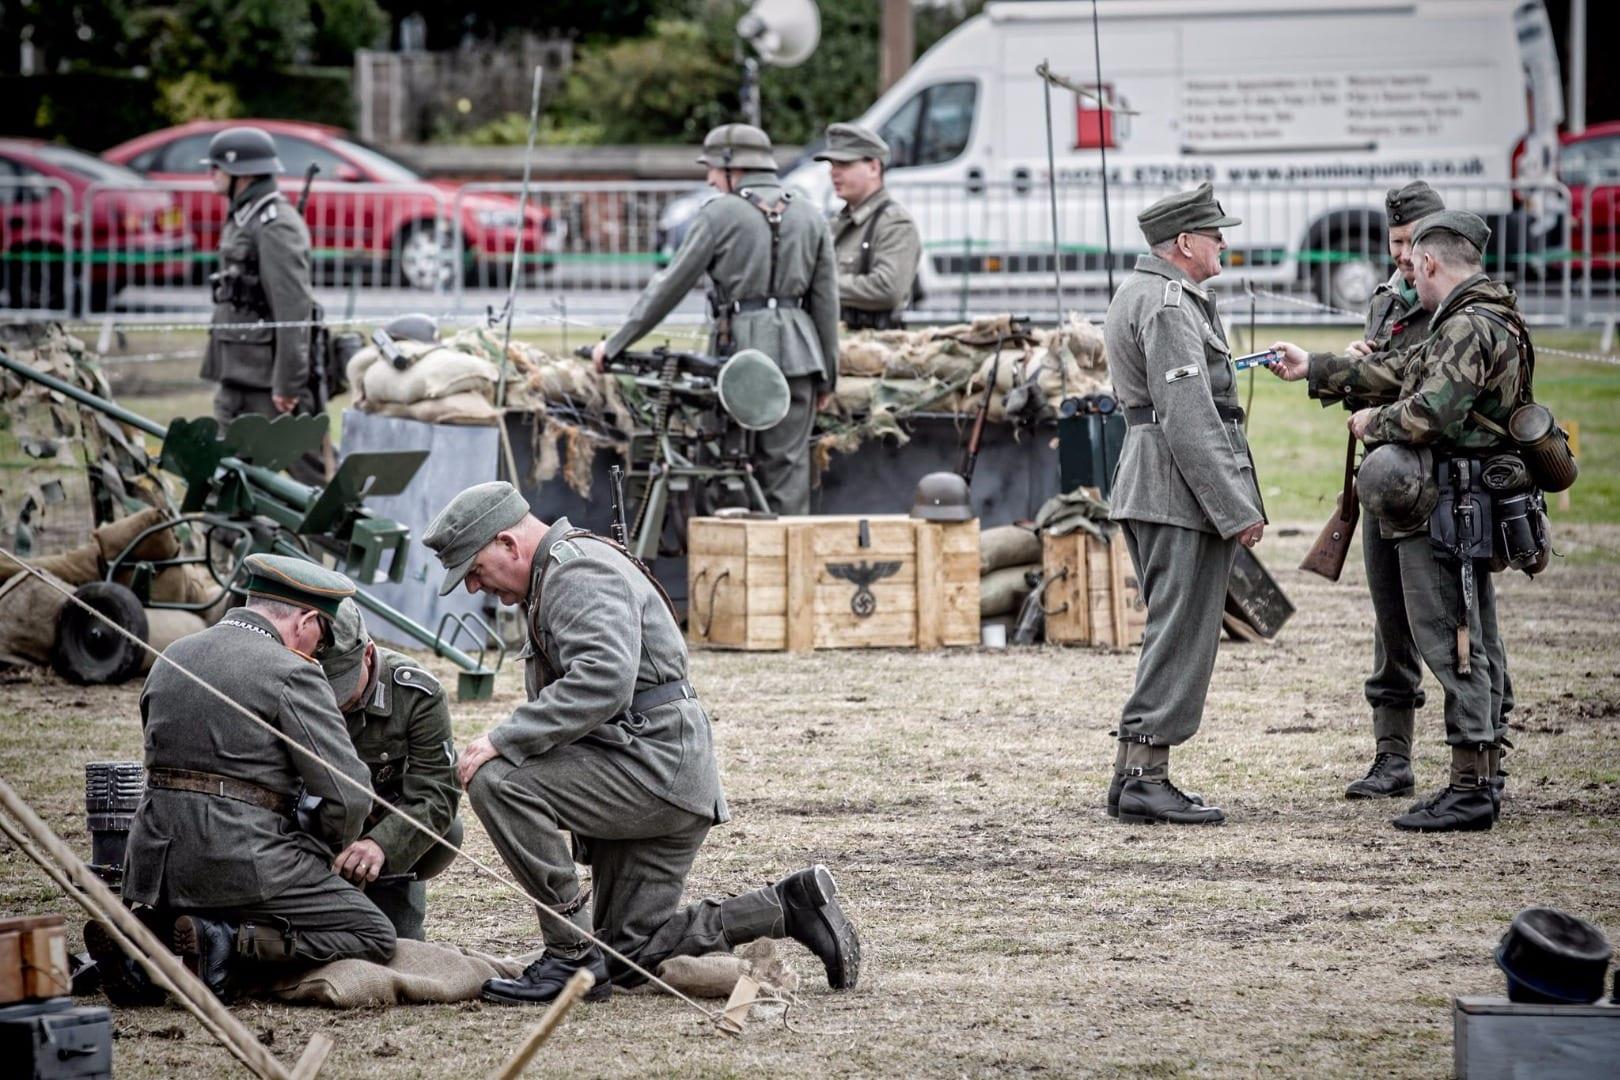 Lytham1940's Festival - Wartime Weekend